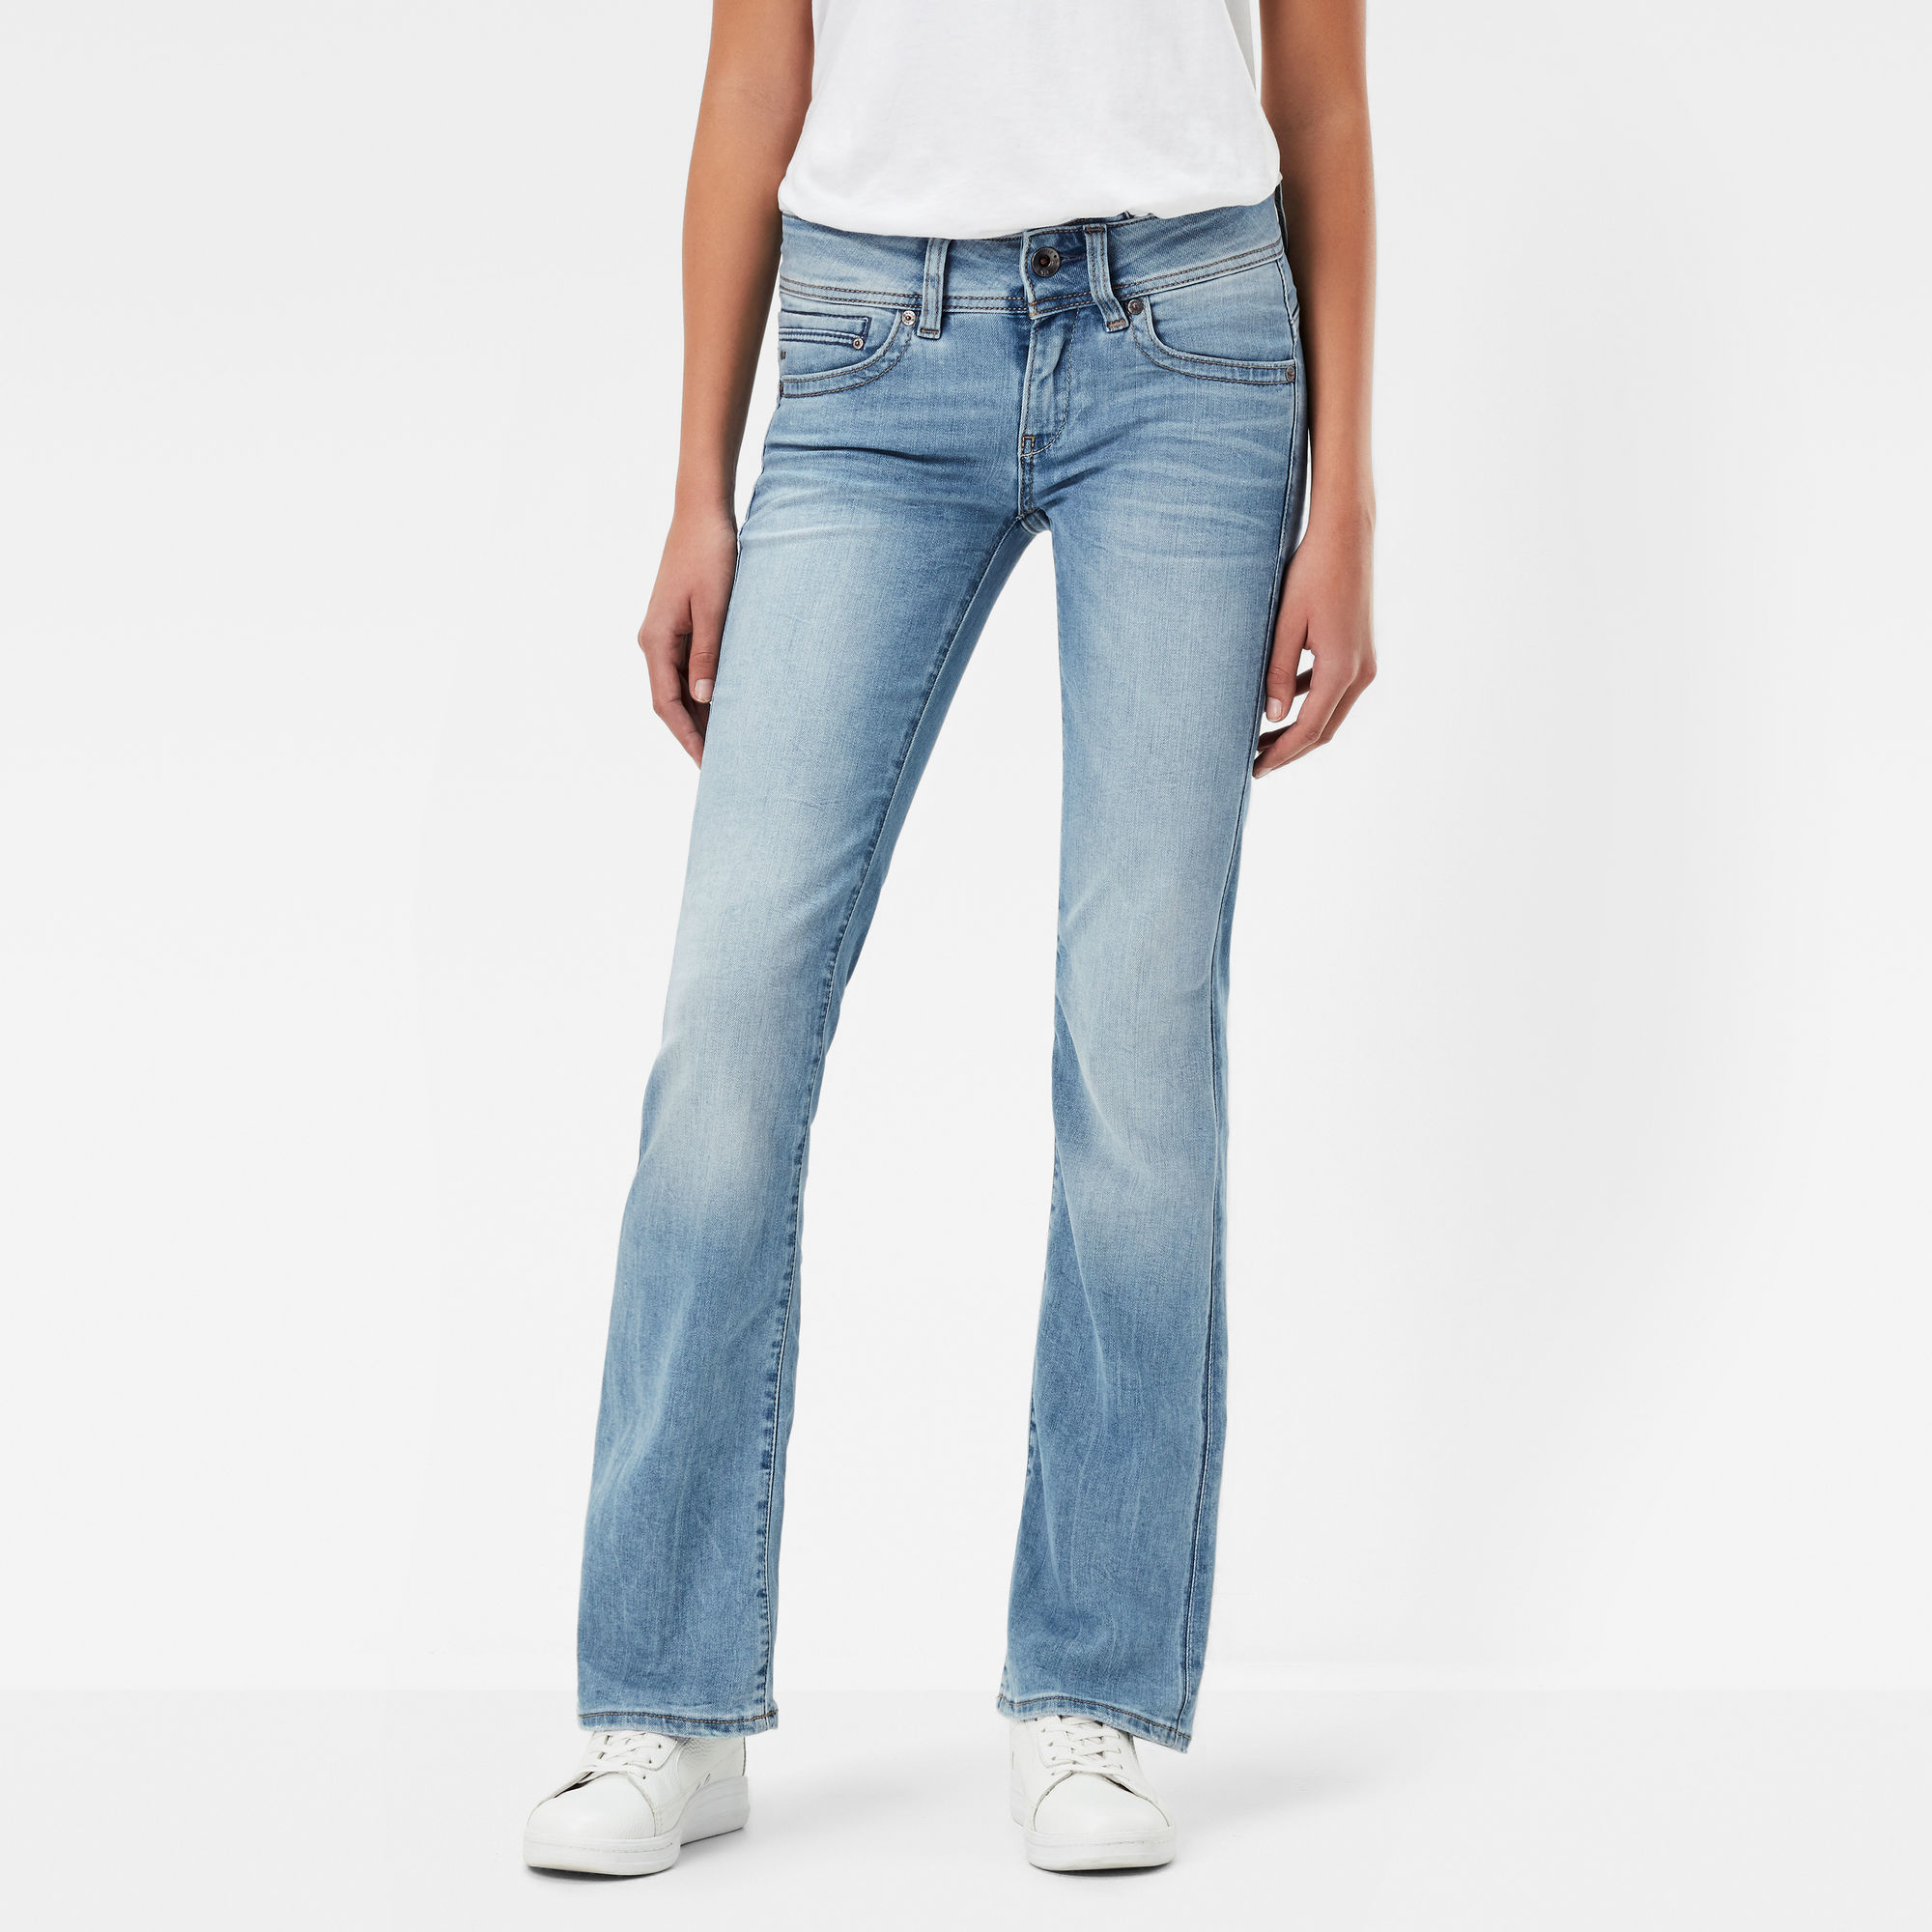 G-Star RAW Dames Midge Saddle Mid Waist Skinny Bootcut Jeans Lichtblauw